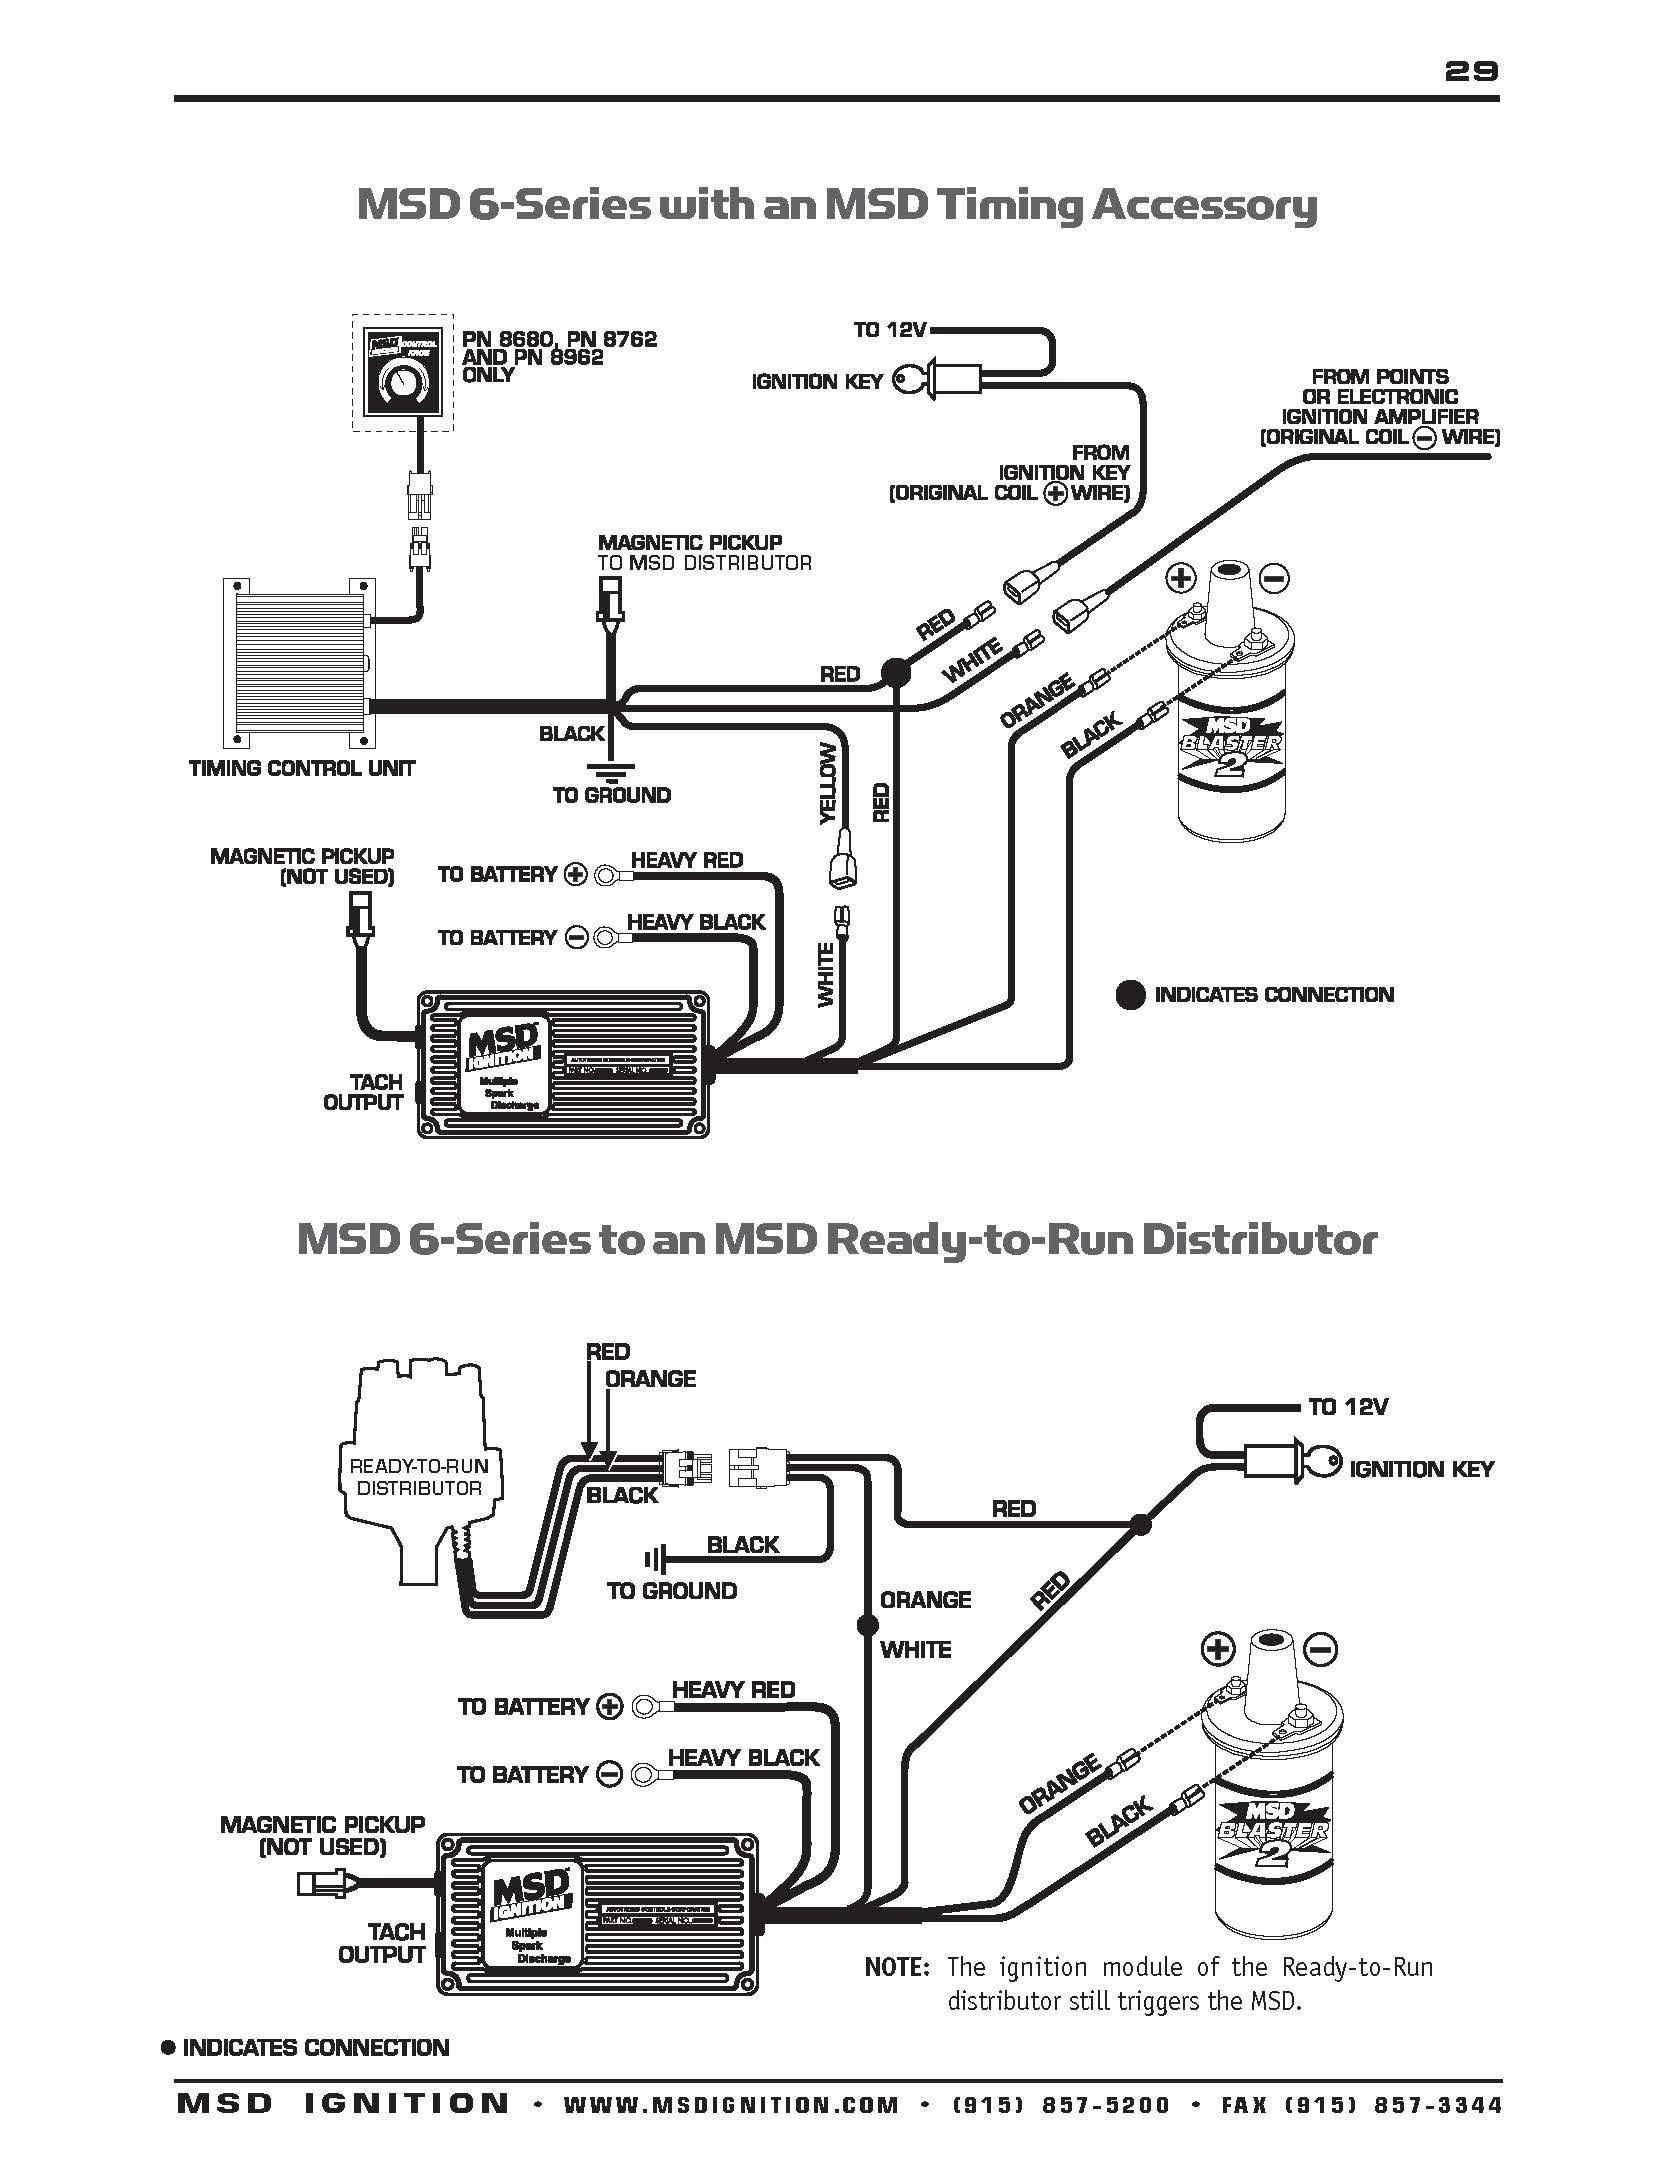 msd 6btm wiring diagram Download-msd 6btm wiring diagram gallery wiring diagram sample rh faceitsalon Basic Ignition Wiring Diagram Ford Ignition Wiring Diagram 7-c